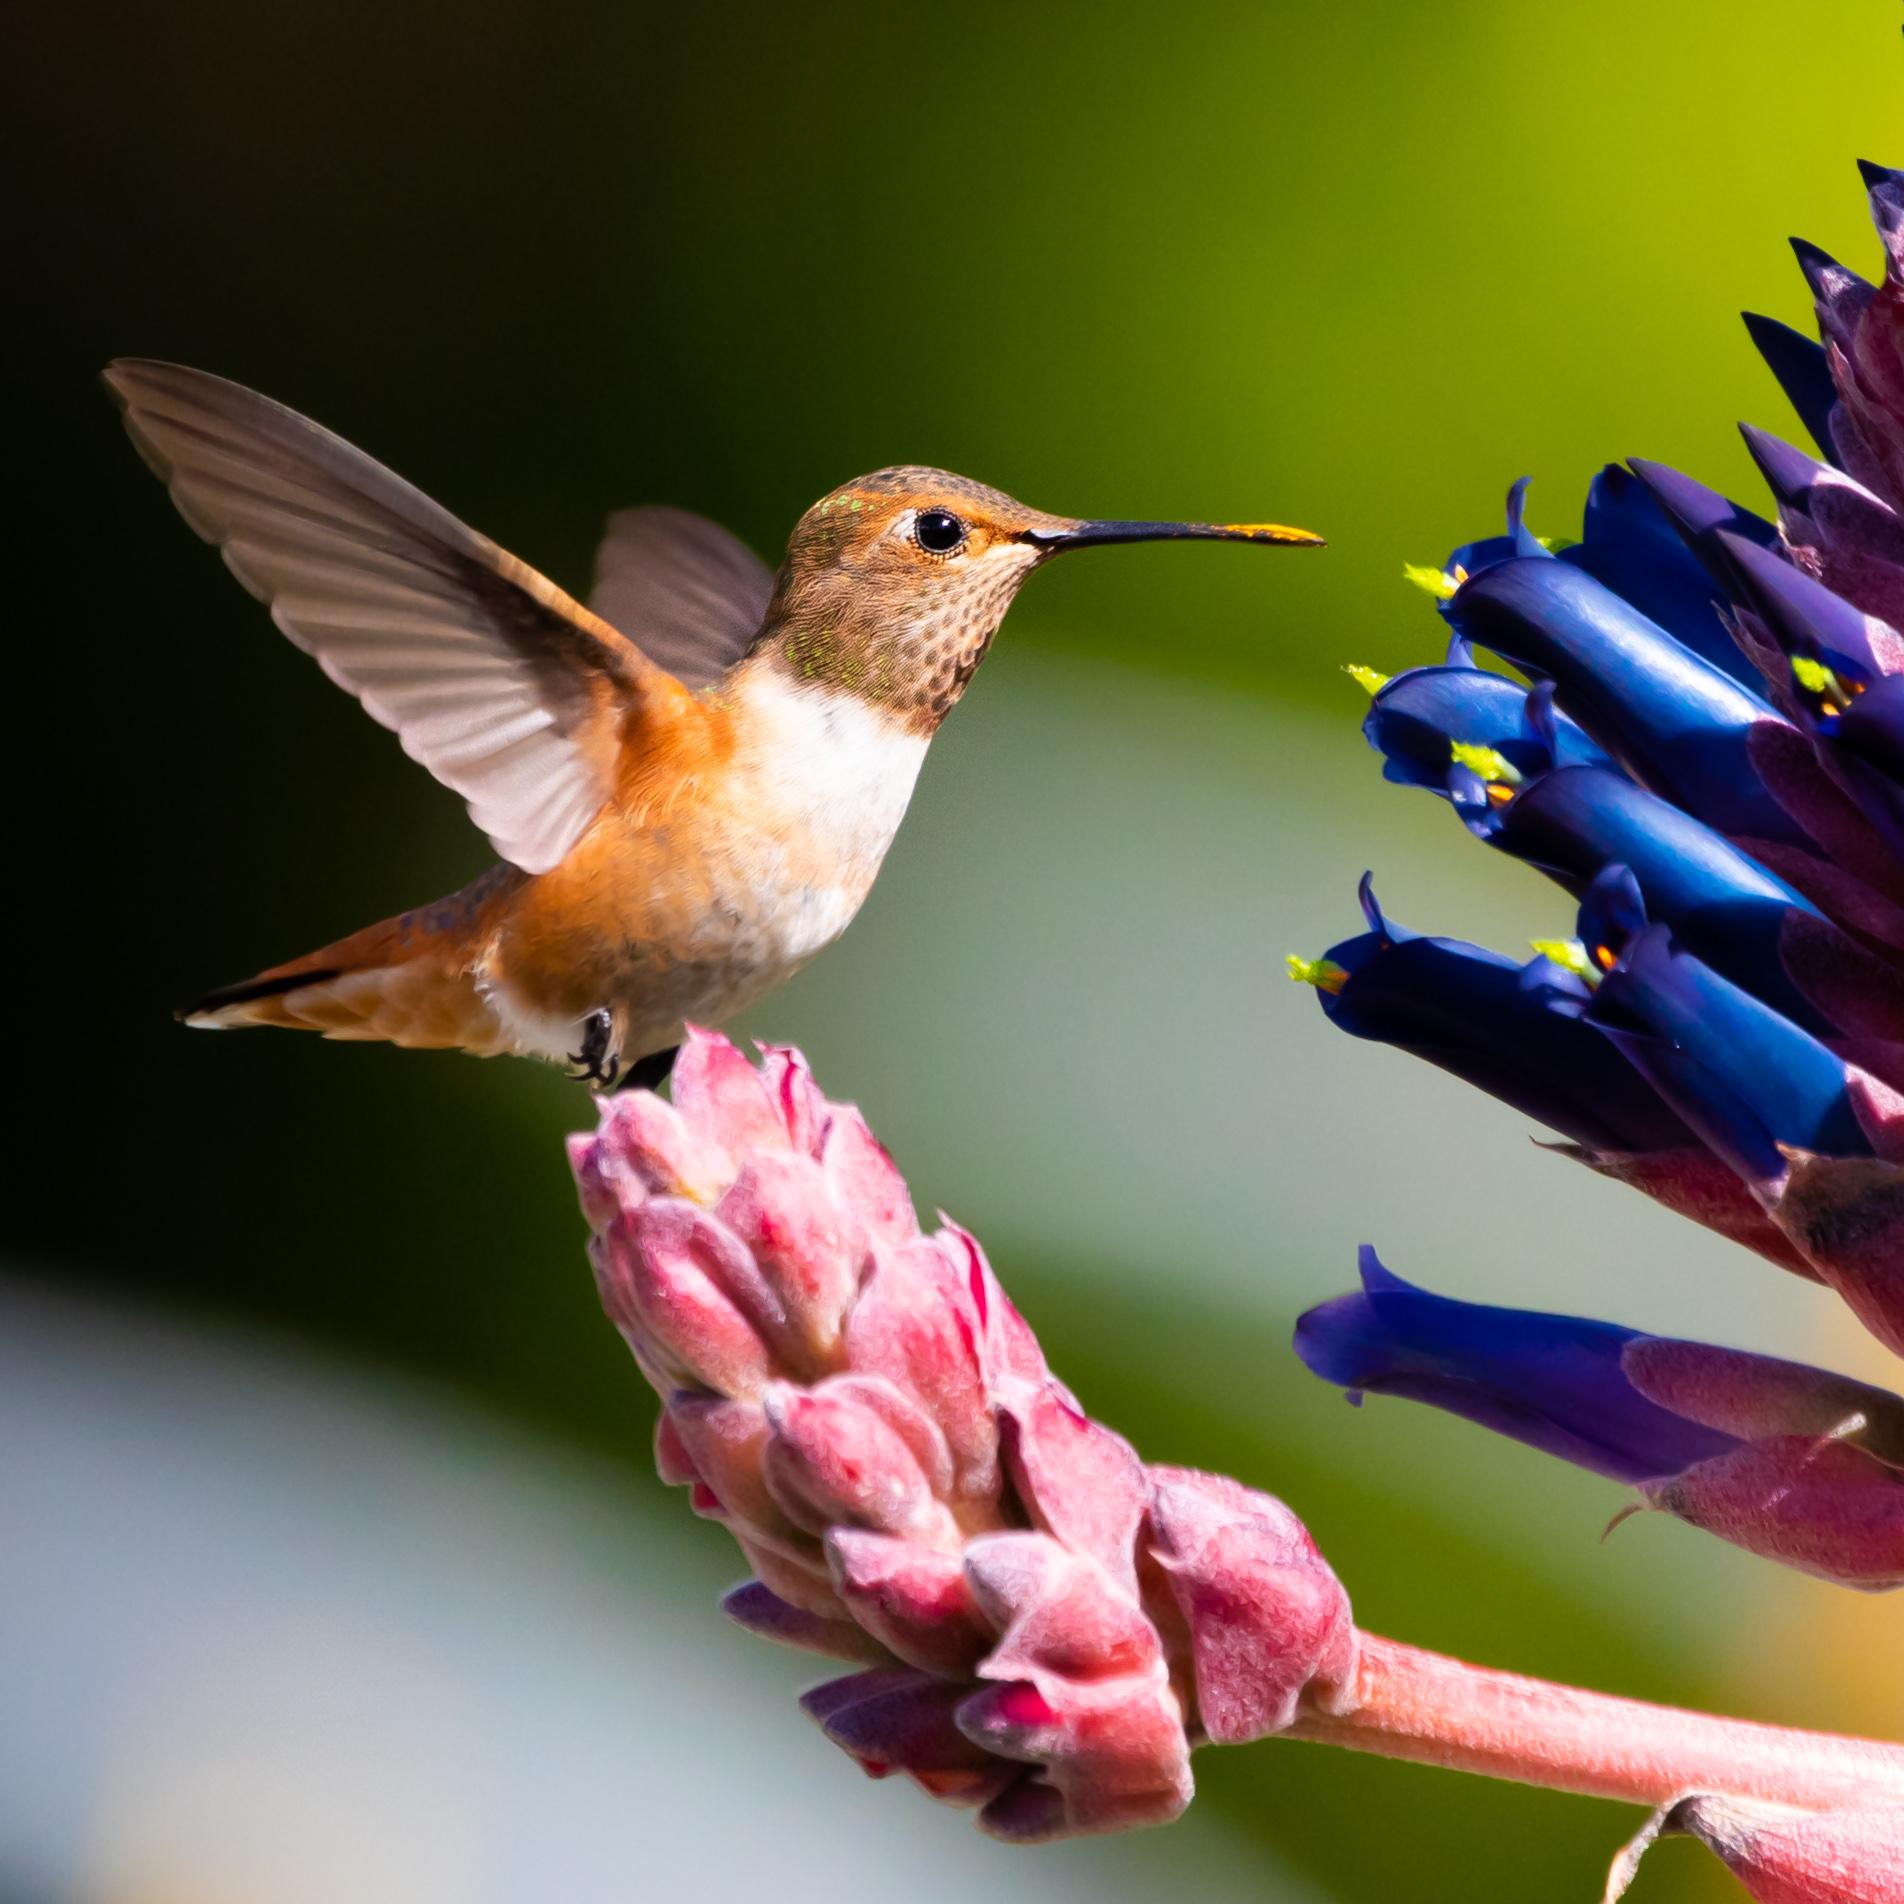 Hummingbird, Huntington Library, CA